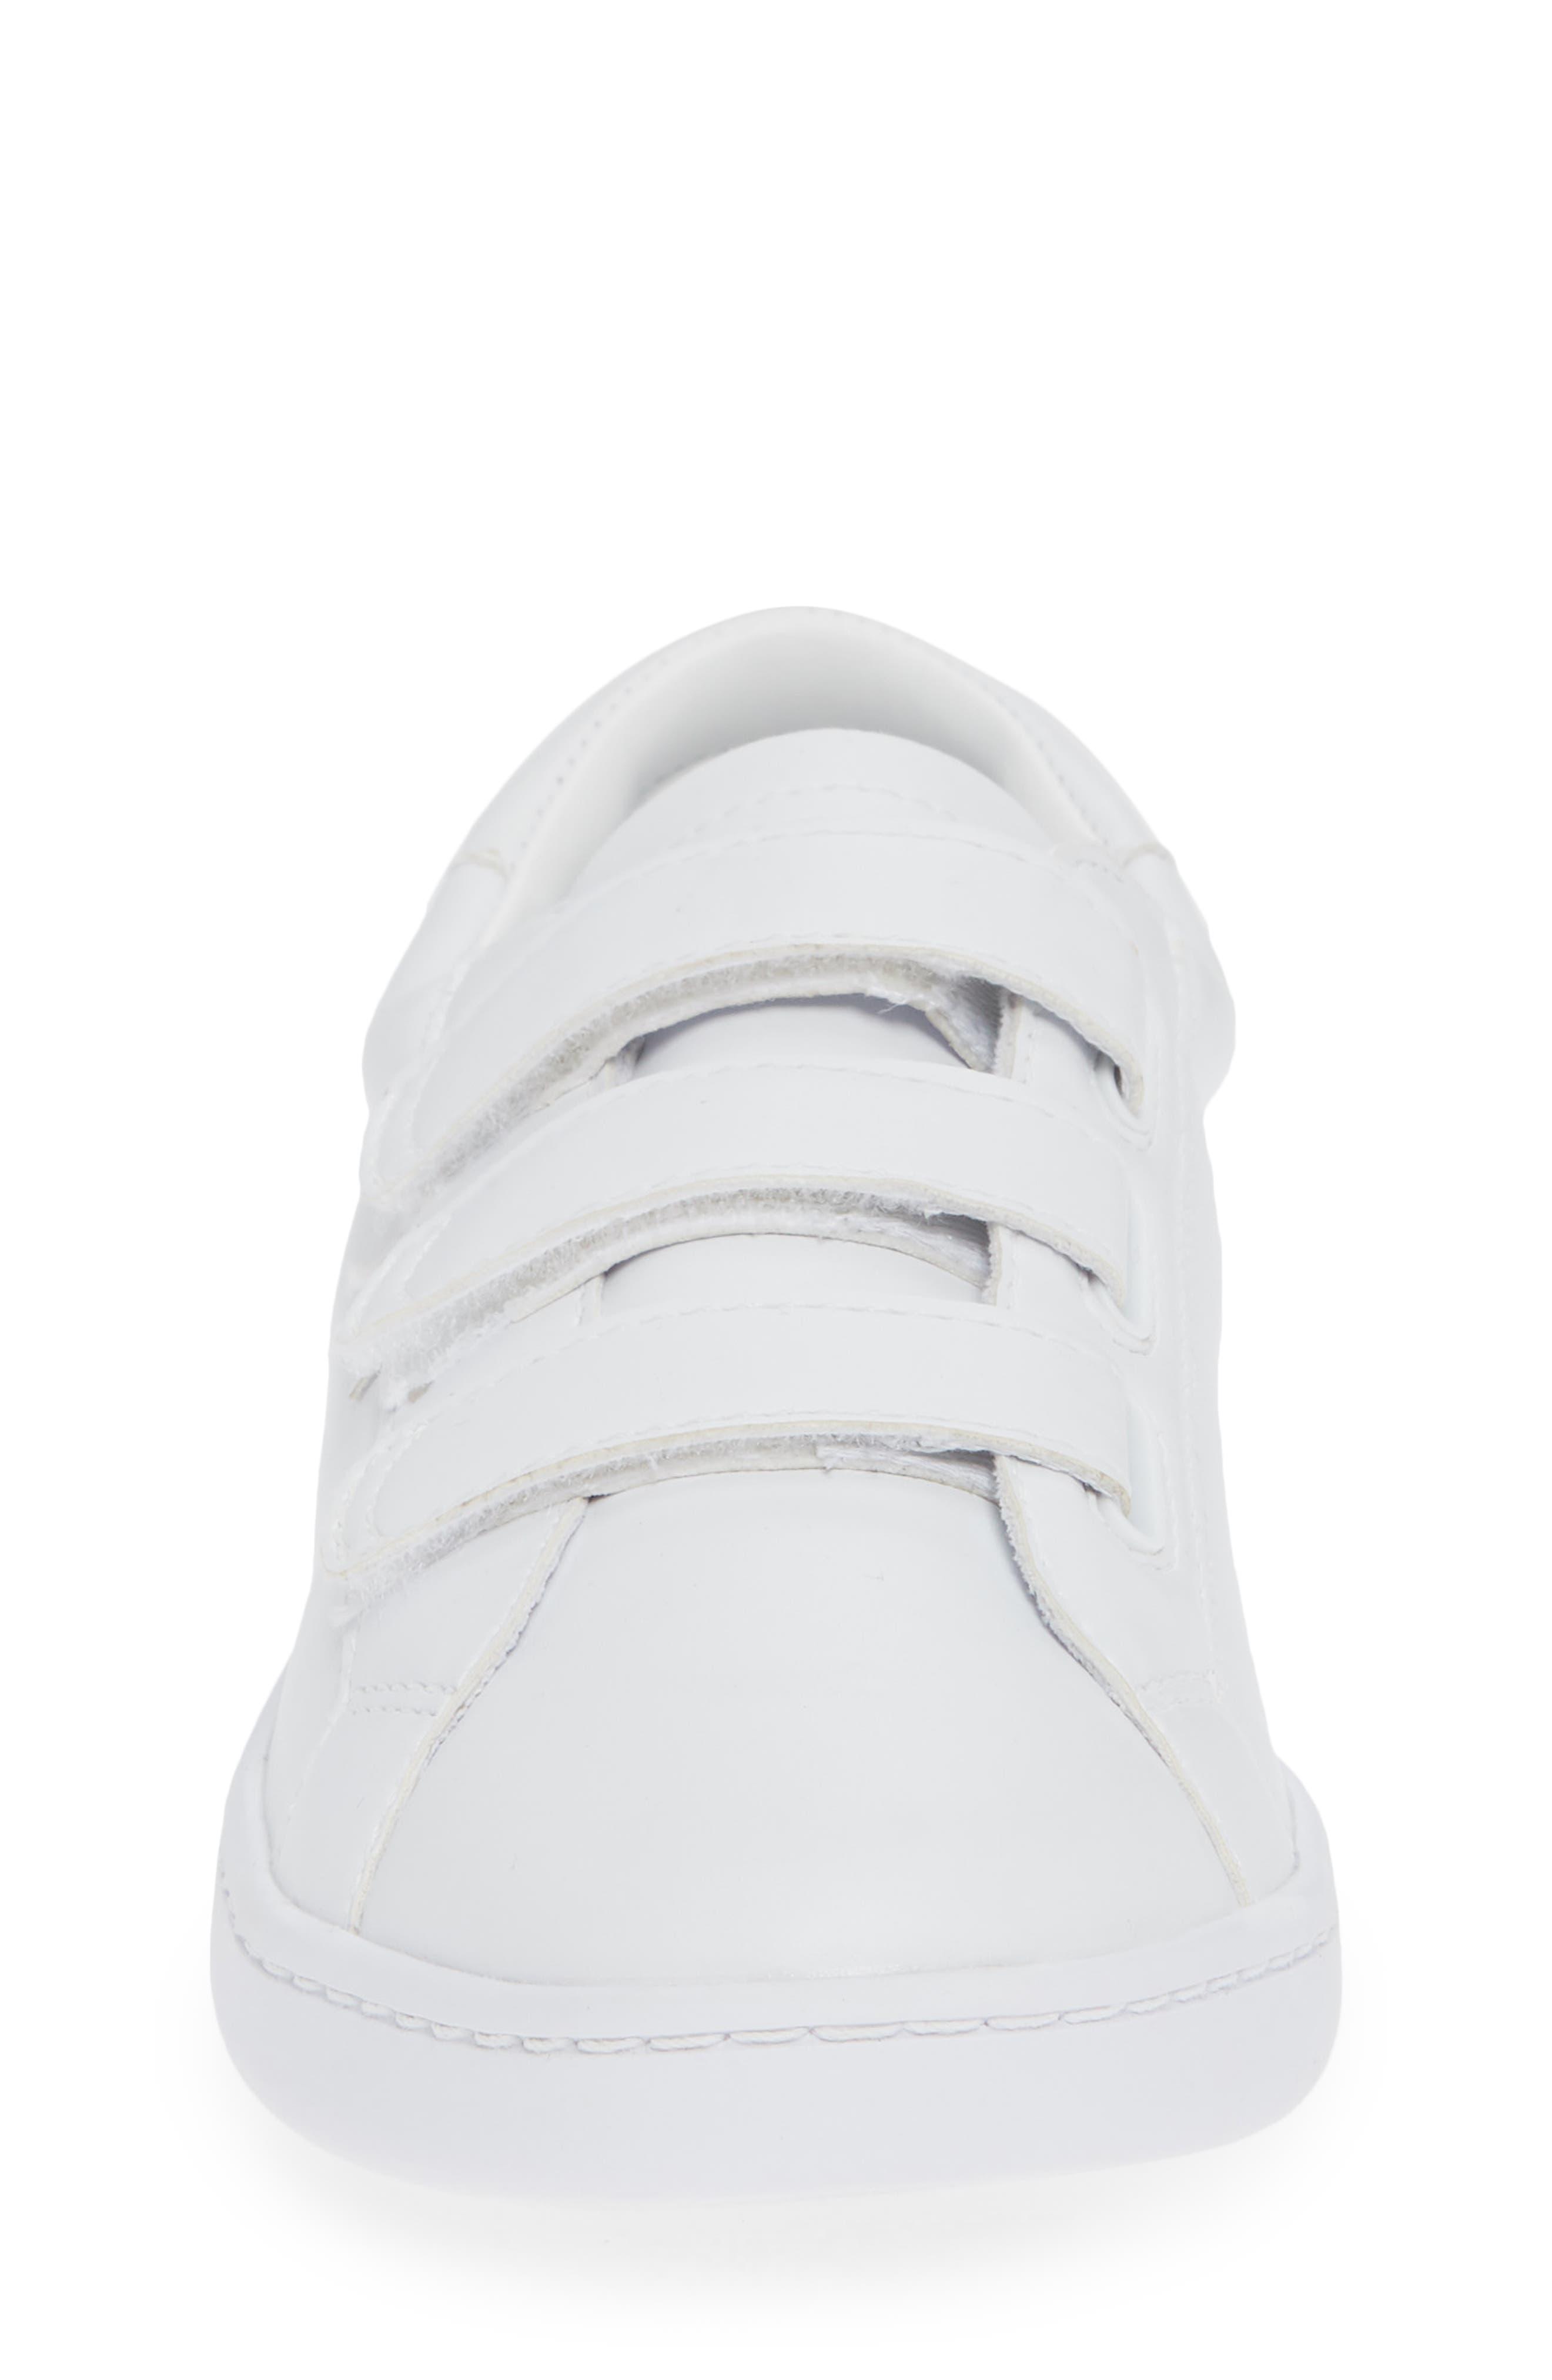 KEDS<SUP>®</SUP>, Ace 3V Sneaker, Alternate thumbnail 4, color, 100